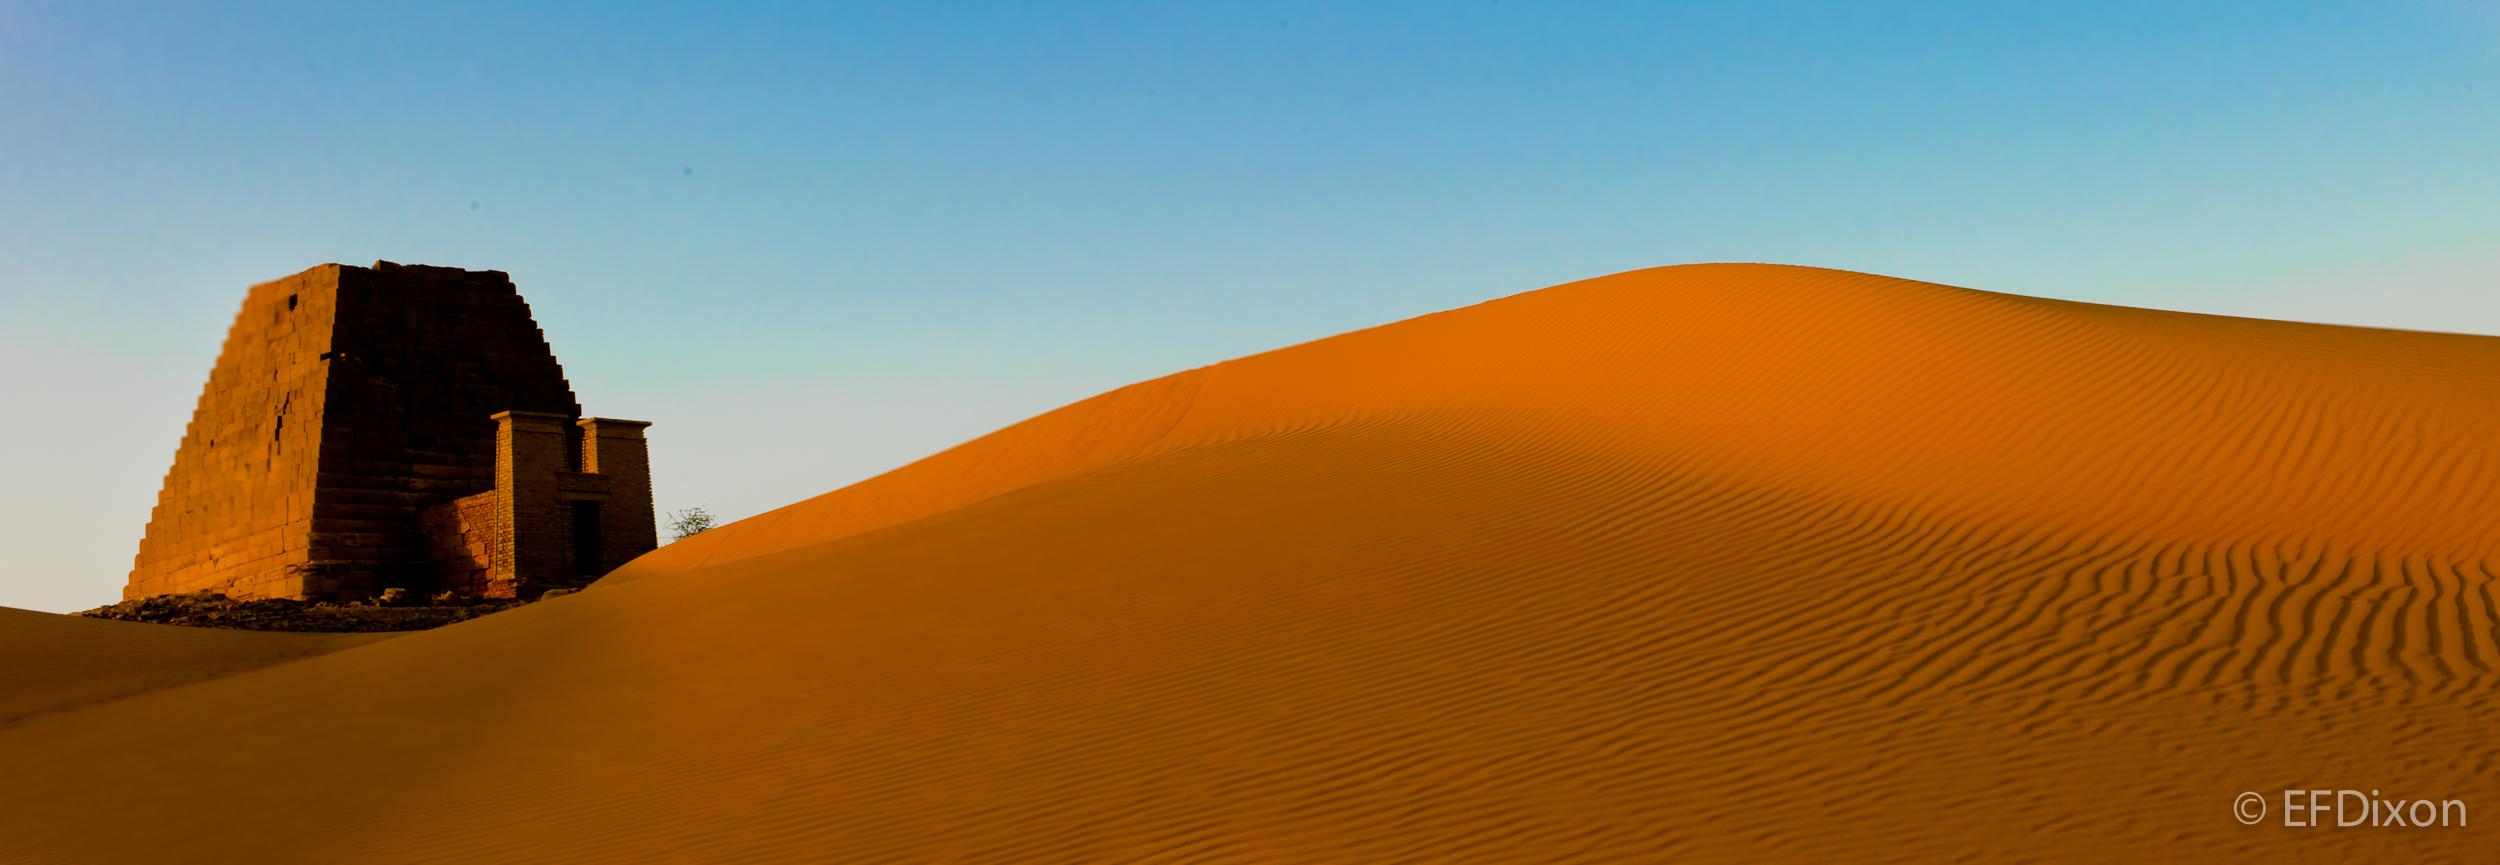 Sudan Leica -136